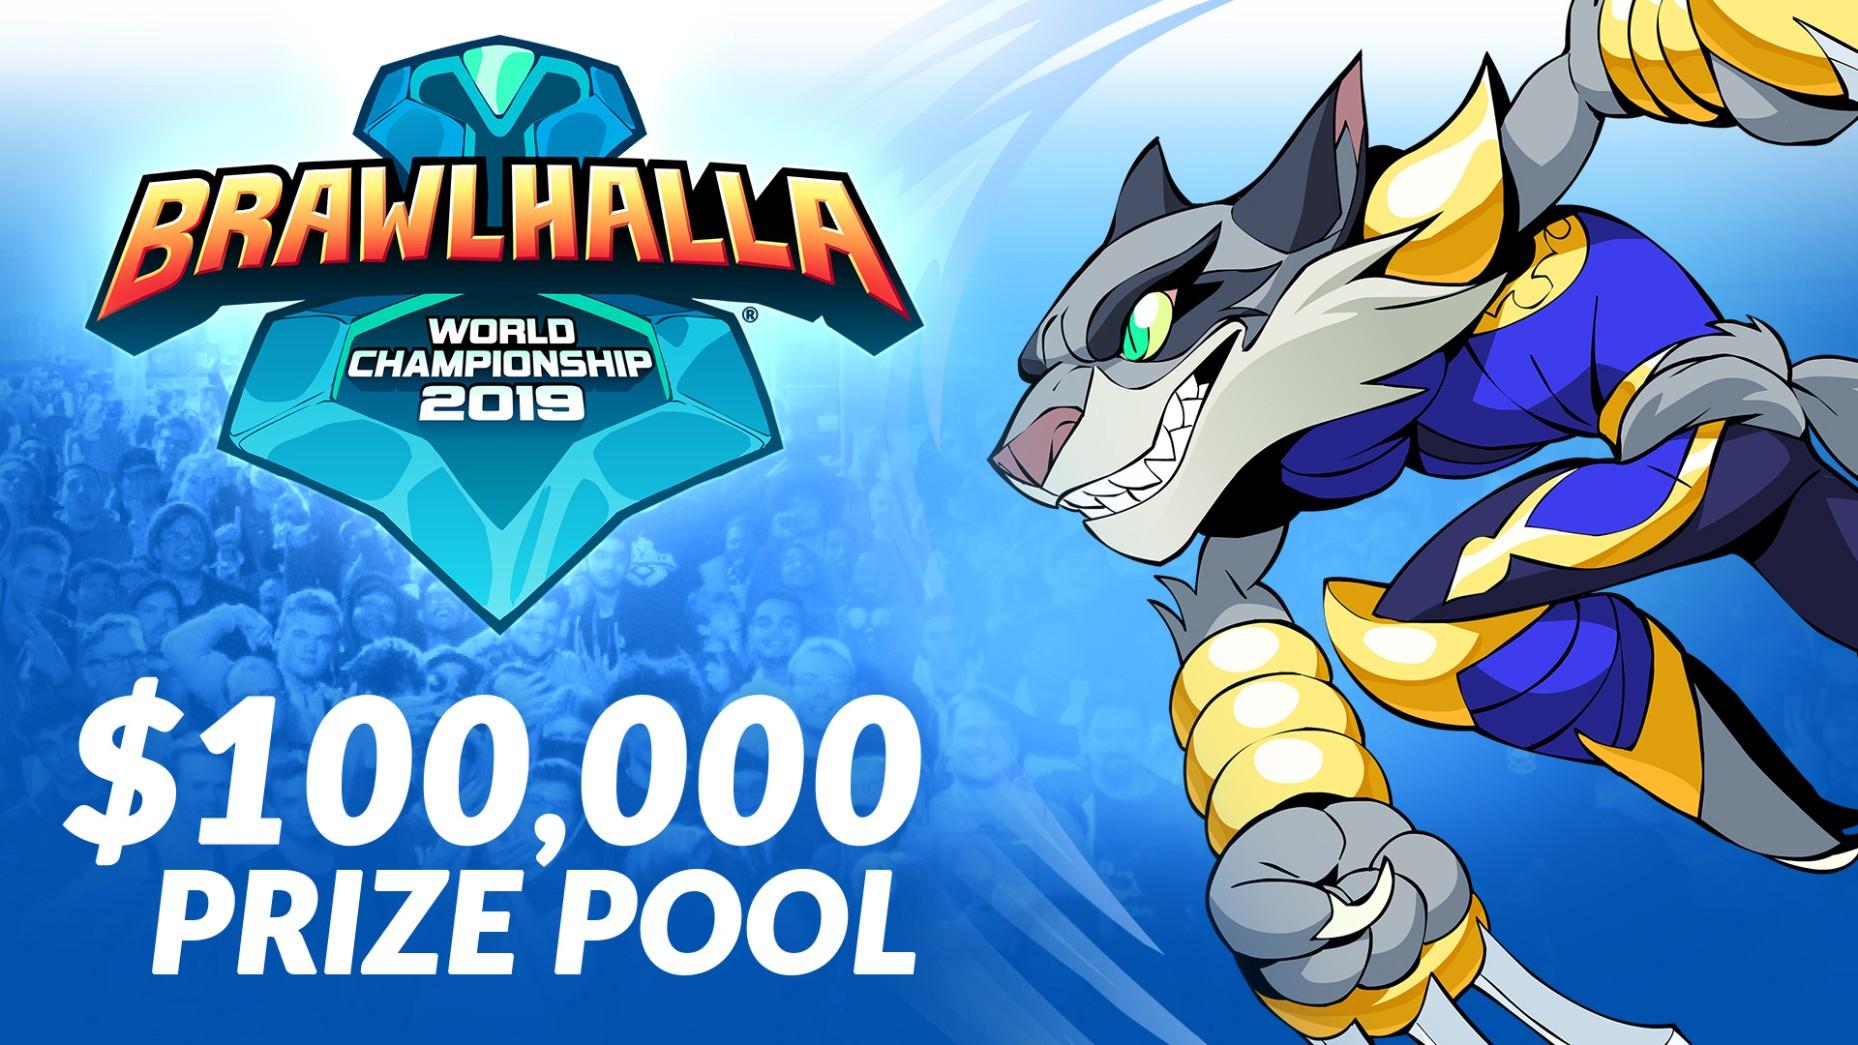 RAWLHALLA 2019 WORLD CHAMPIONSHIP